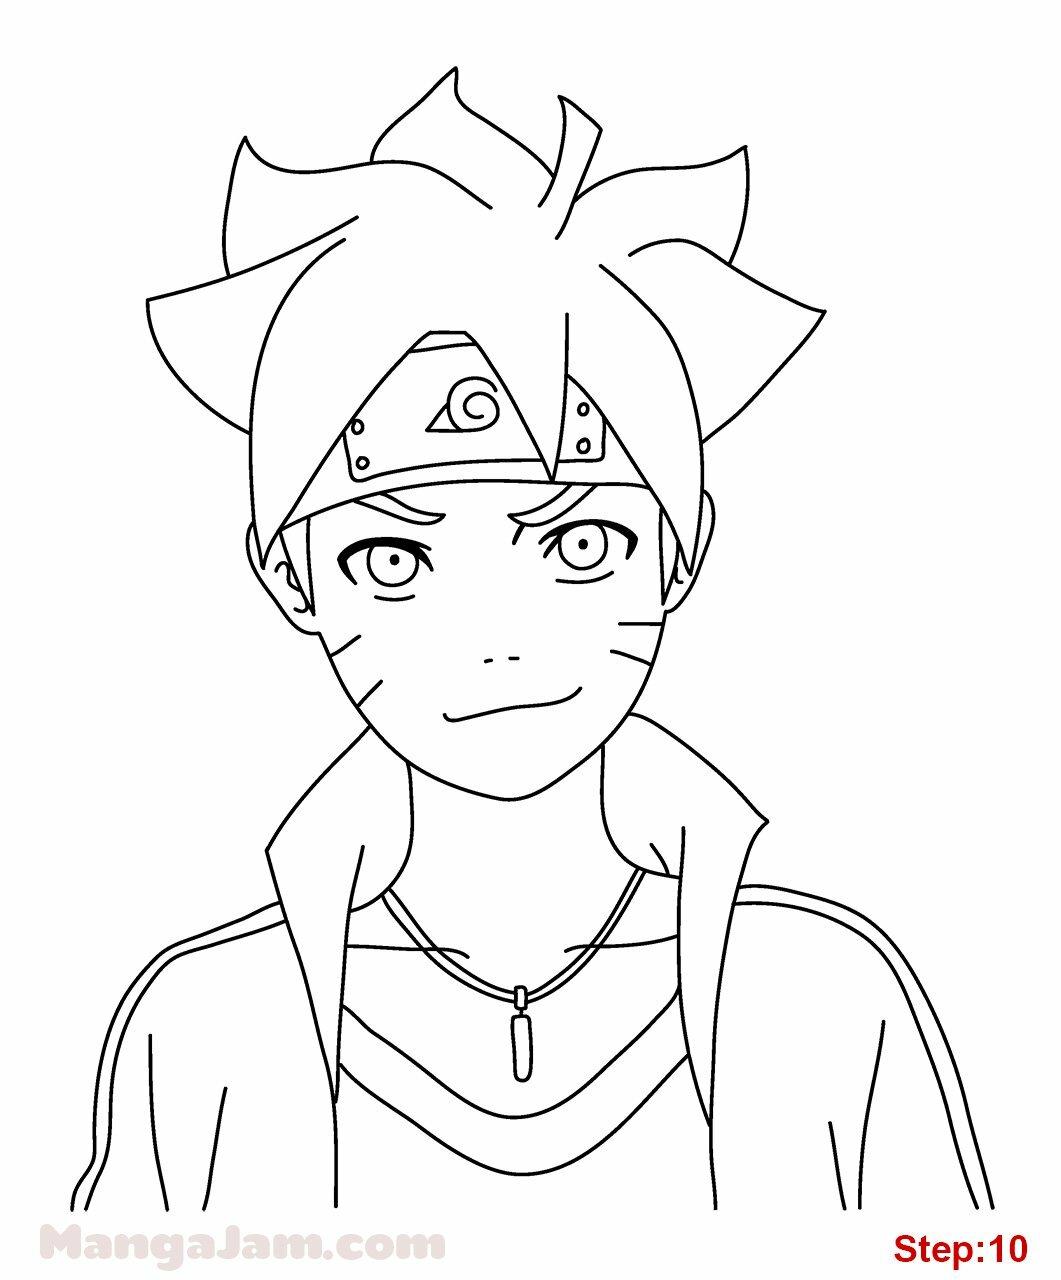 Gambar Anime Boruto Hitam Putih Ez Rasio карточка пользователя